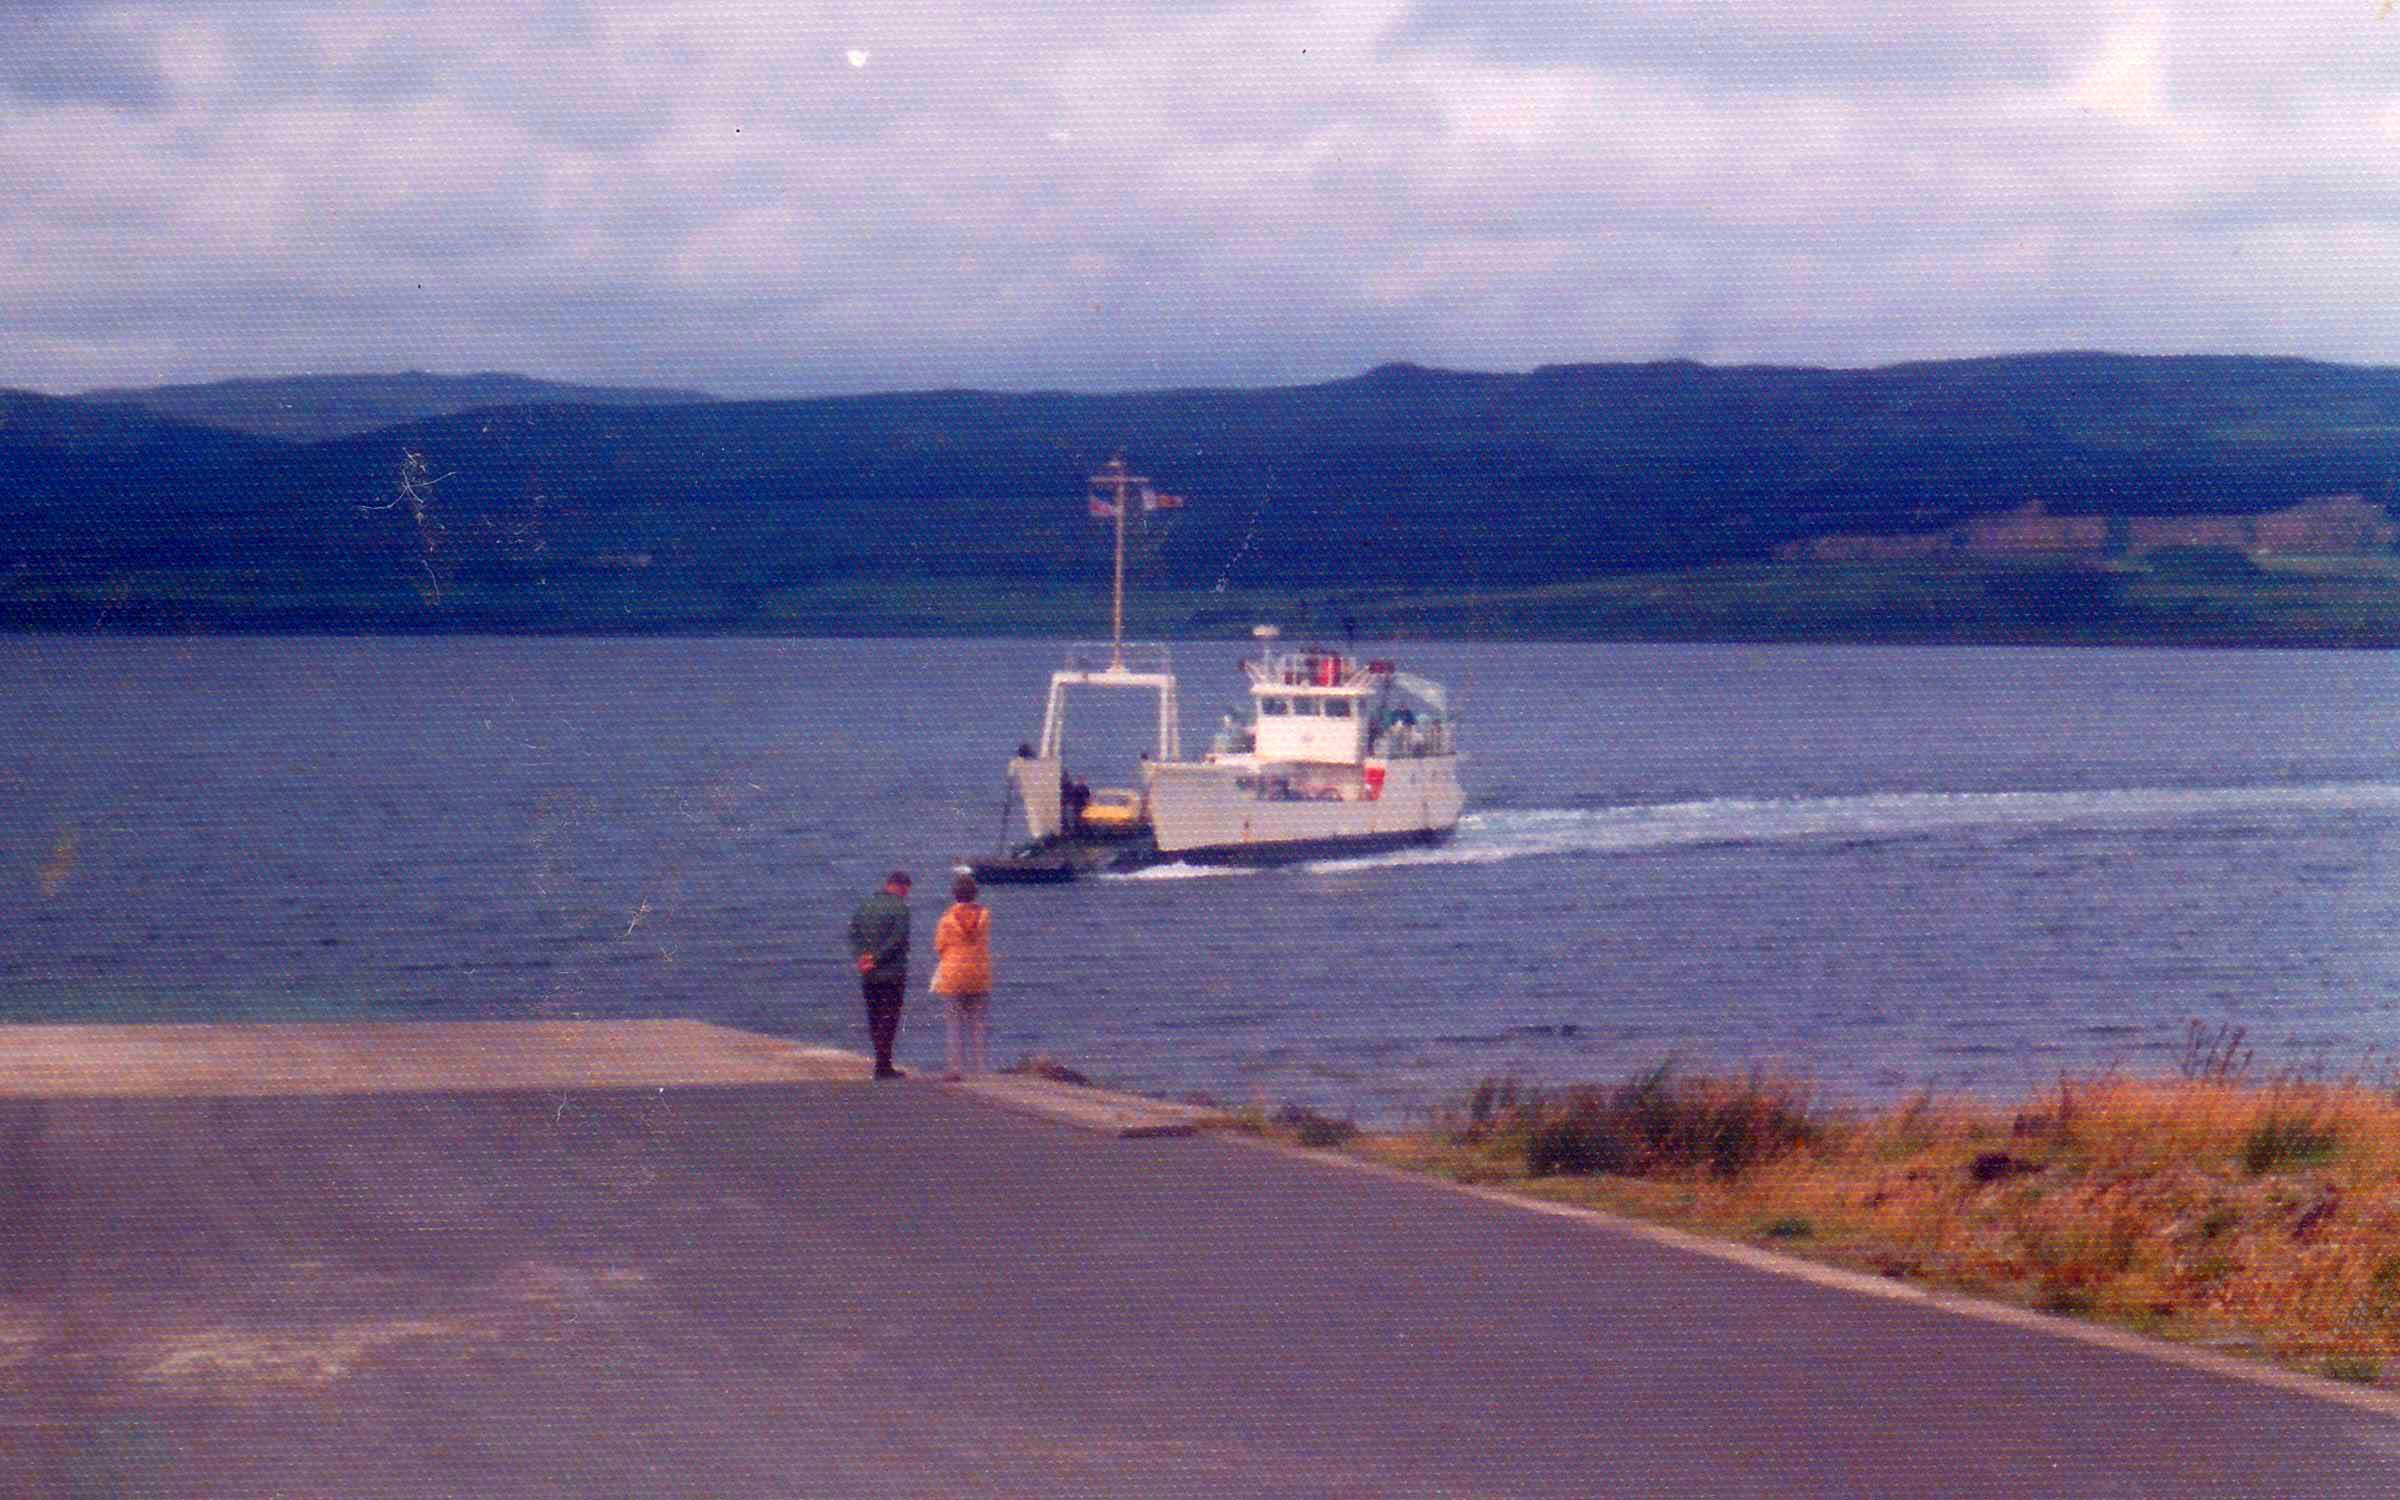 Coll arriving at Fishnish (Ships of CalMac)